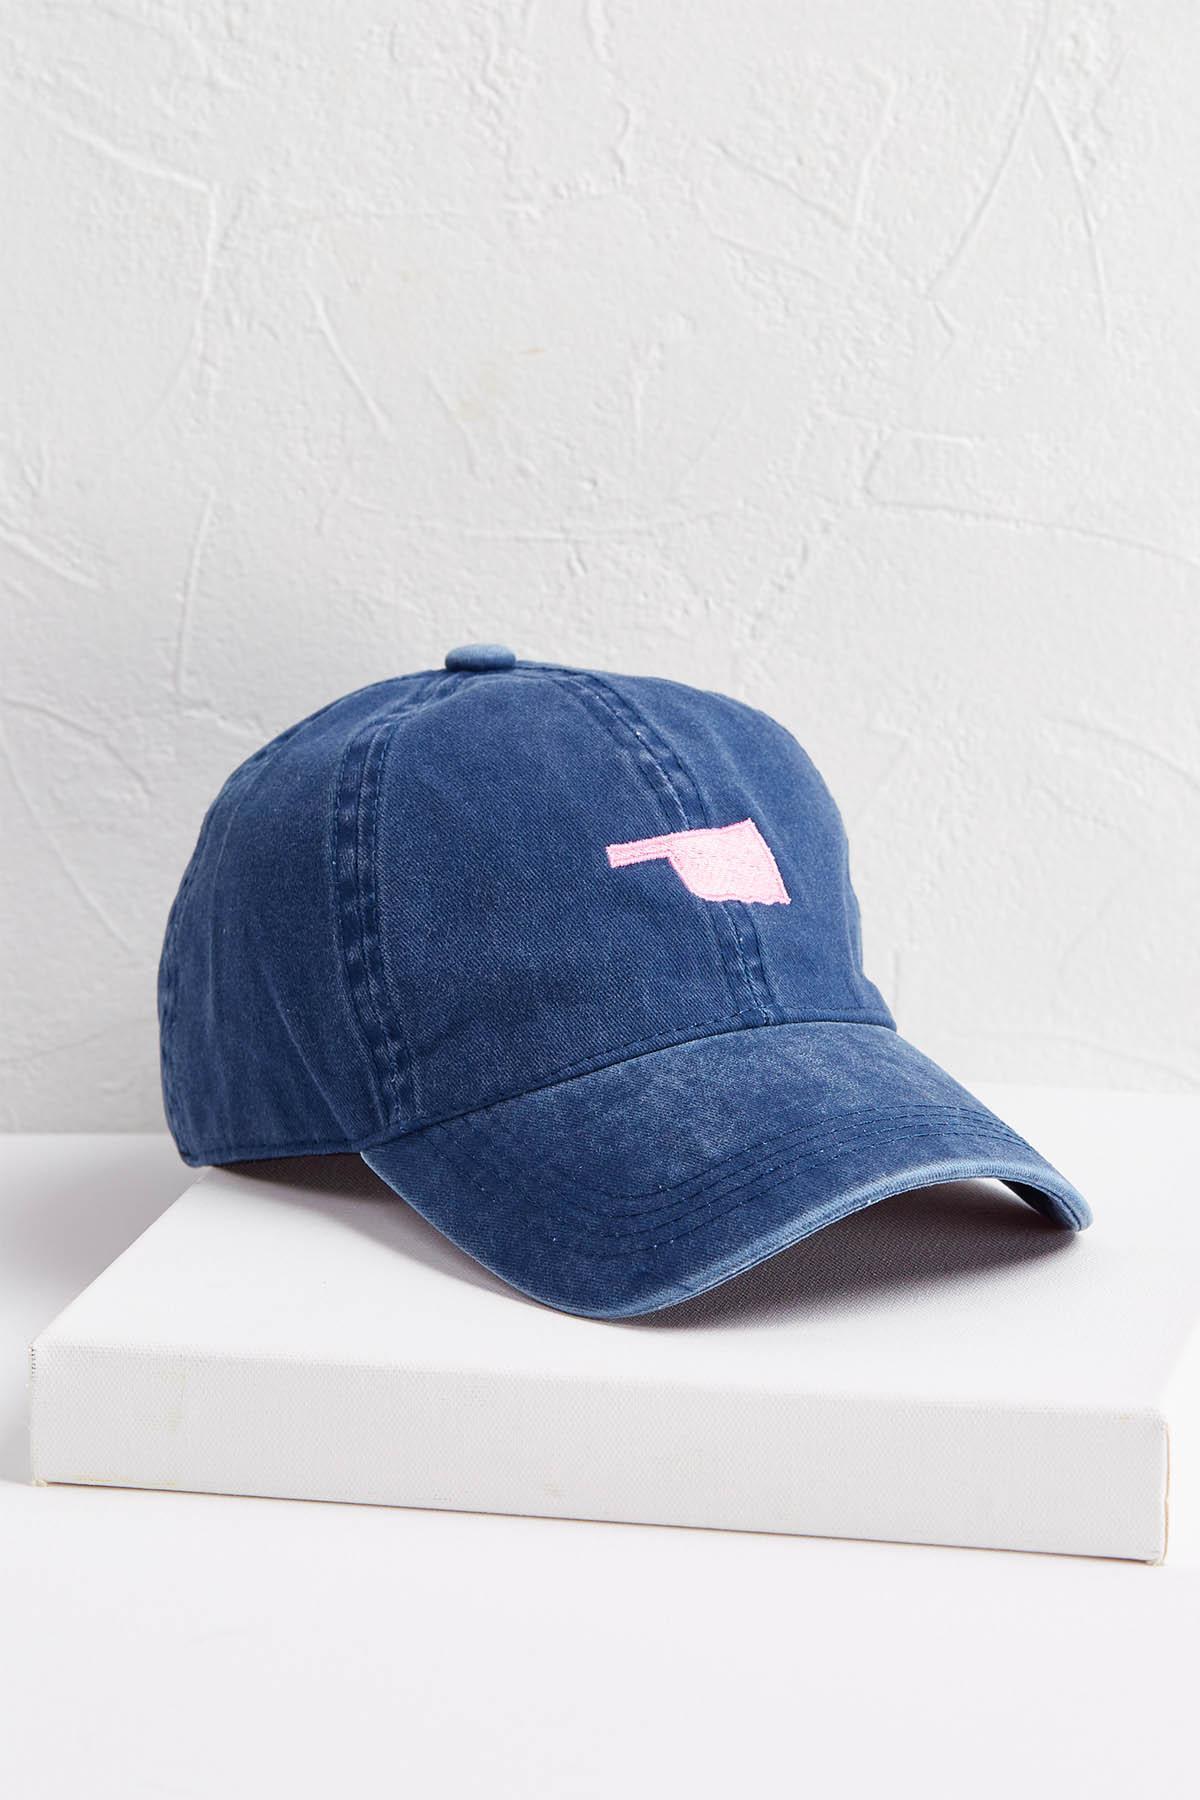 Oklahoma Baseball Hat